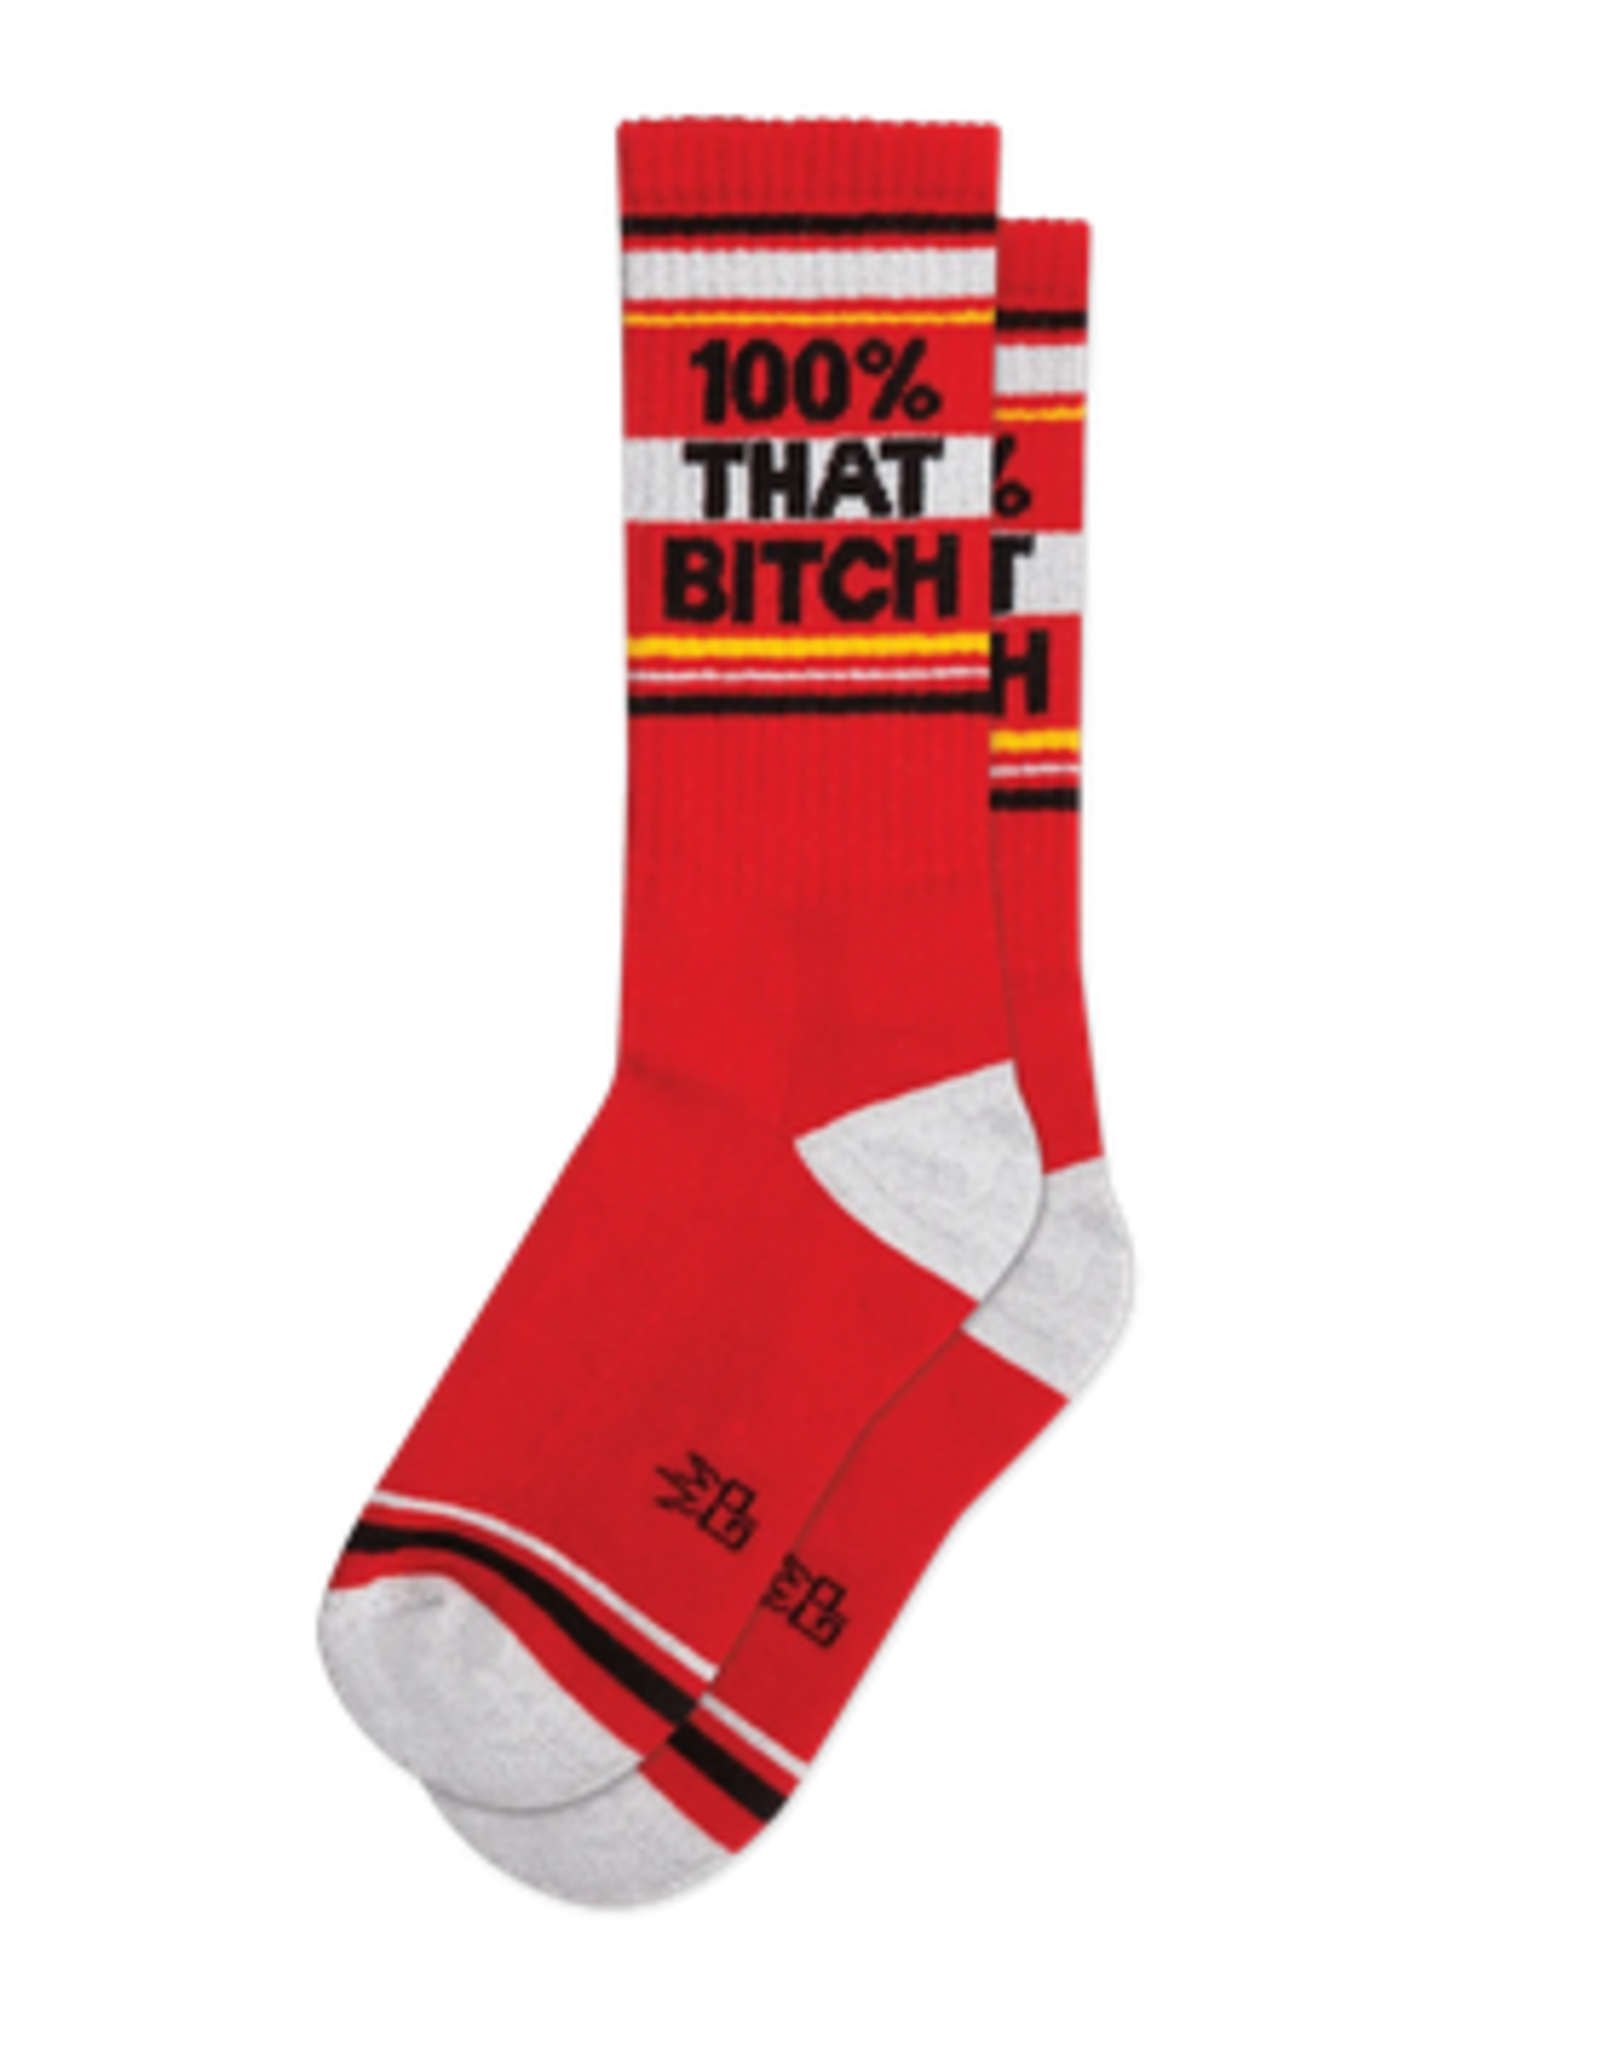 100% That Bitch Ribbed Gym Socks